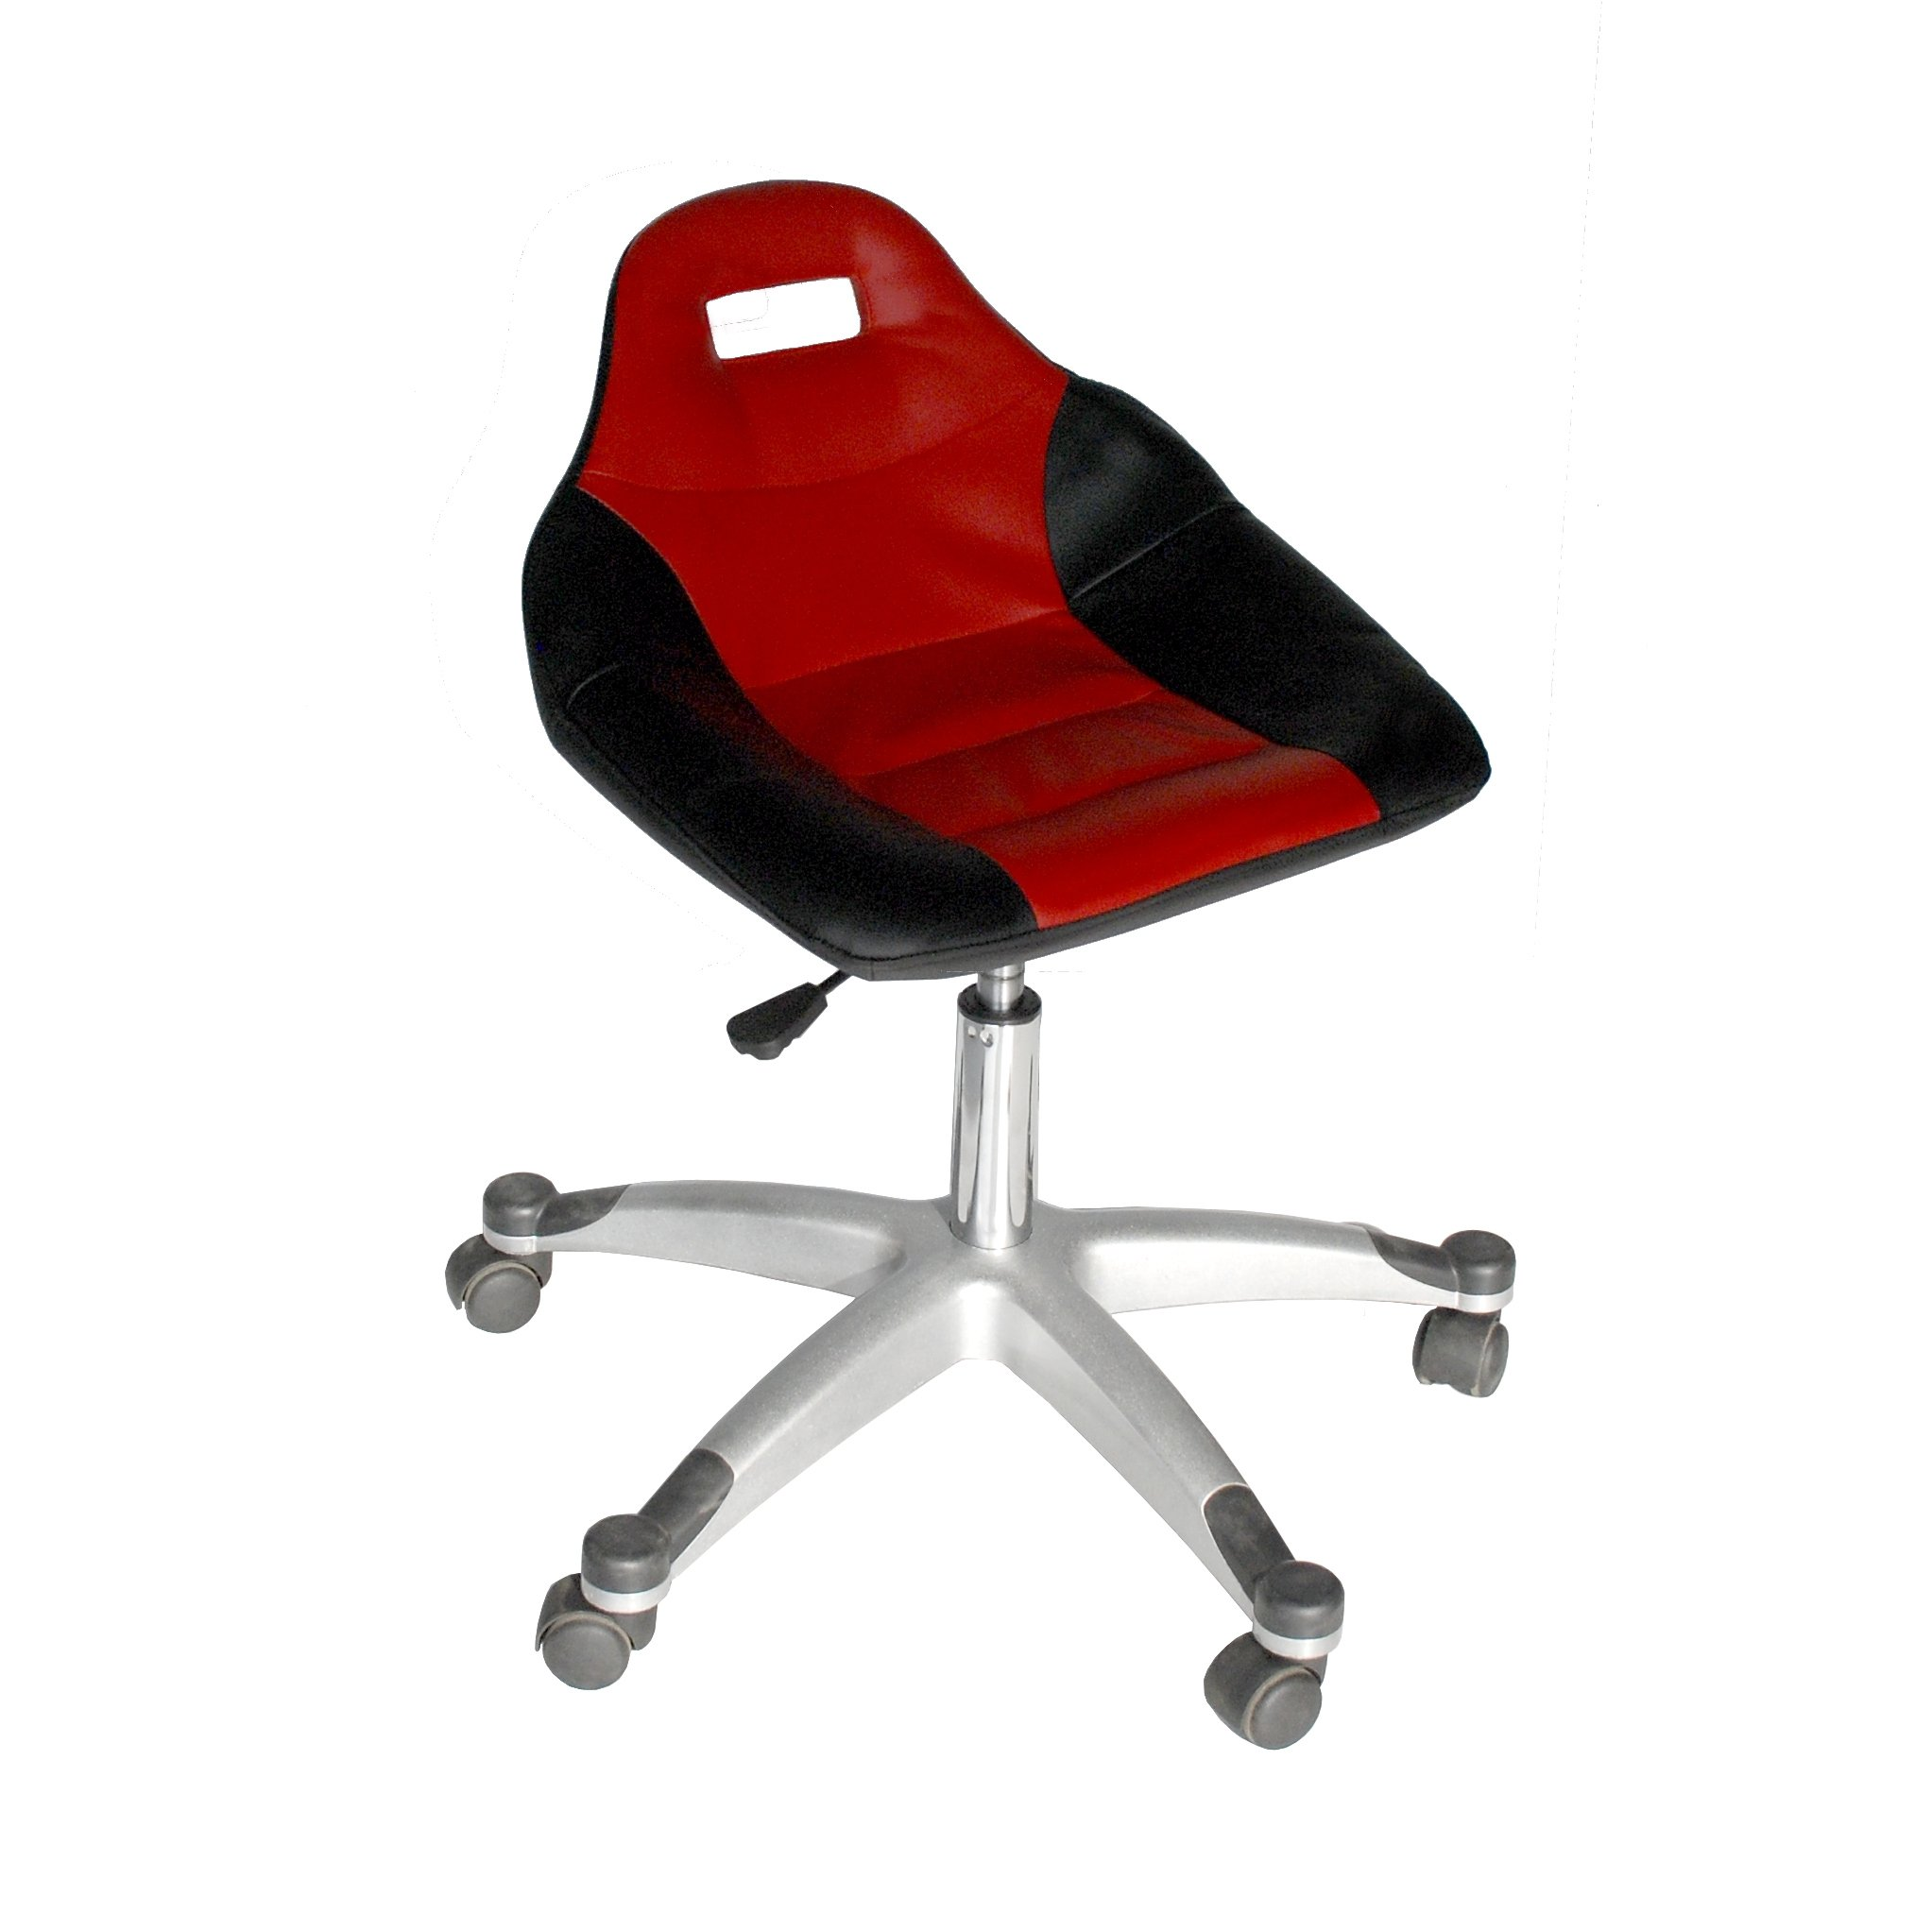 Traxion 4-700 ProGear Office Seat